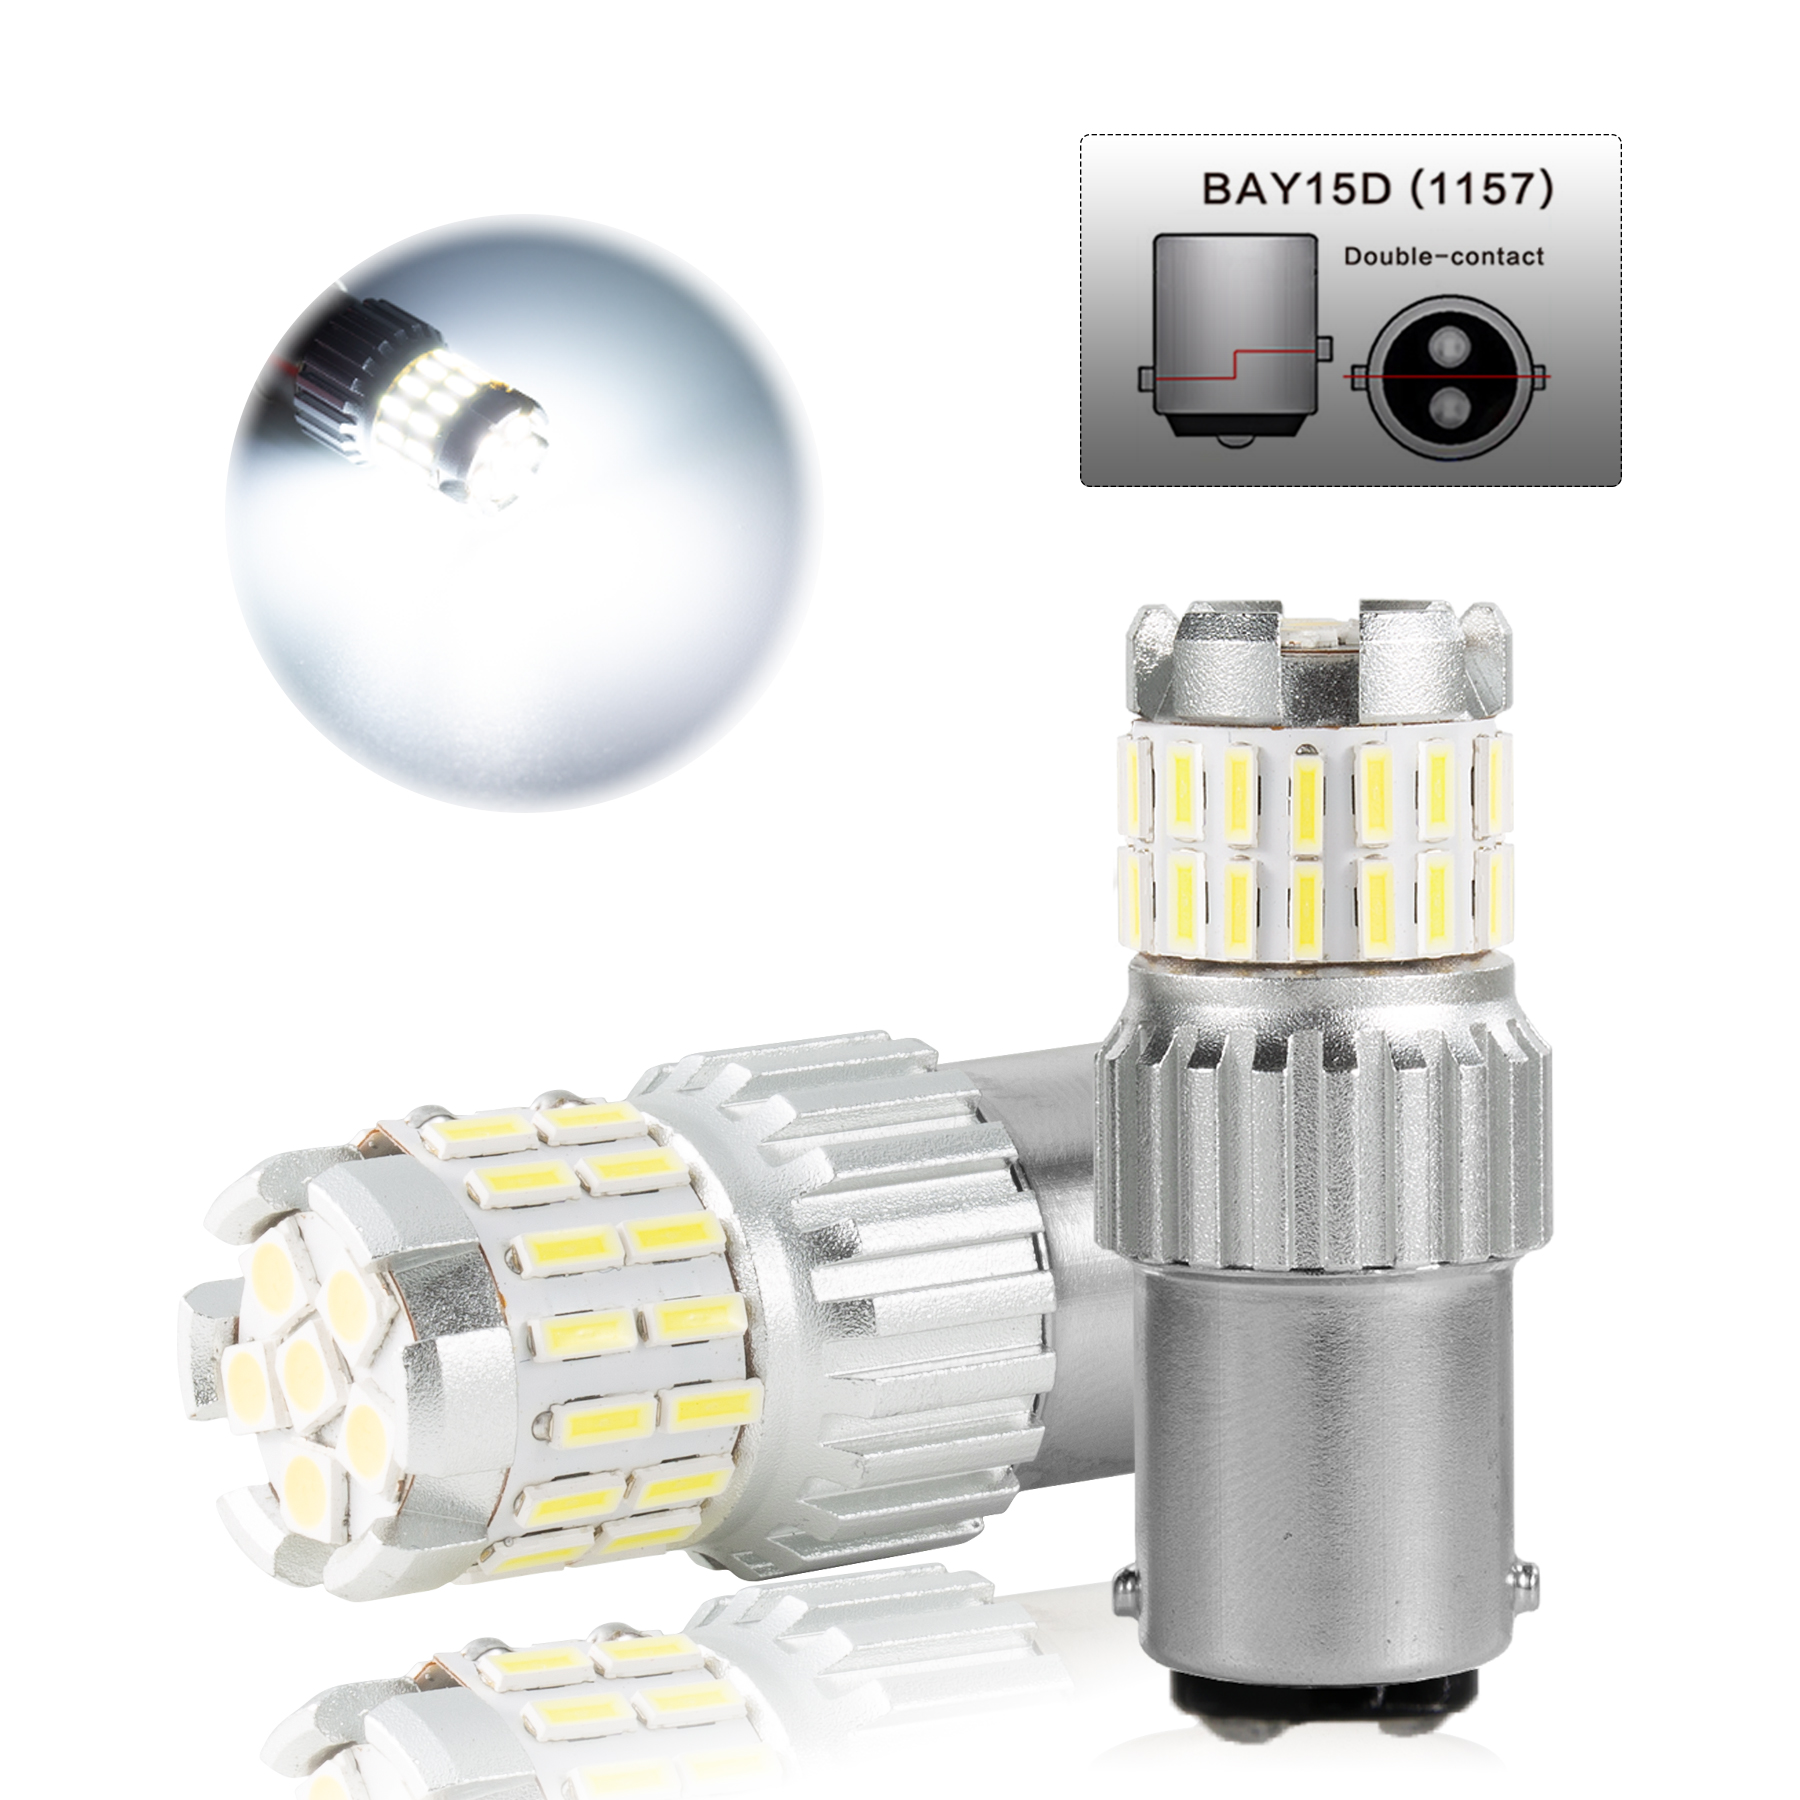 2pcs Fast Heat Disspation Aluminum LED Bulb for Drviaion 1156/1157Canbus Light White light_1157 bay15d p21-5w